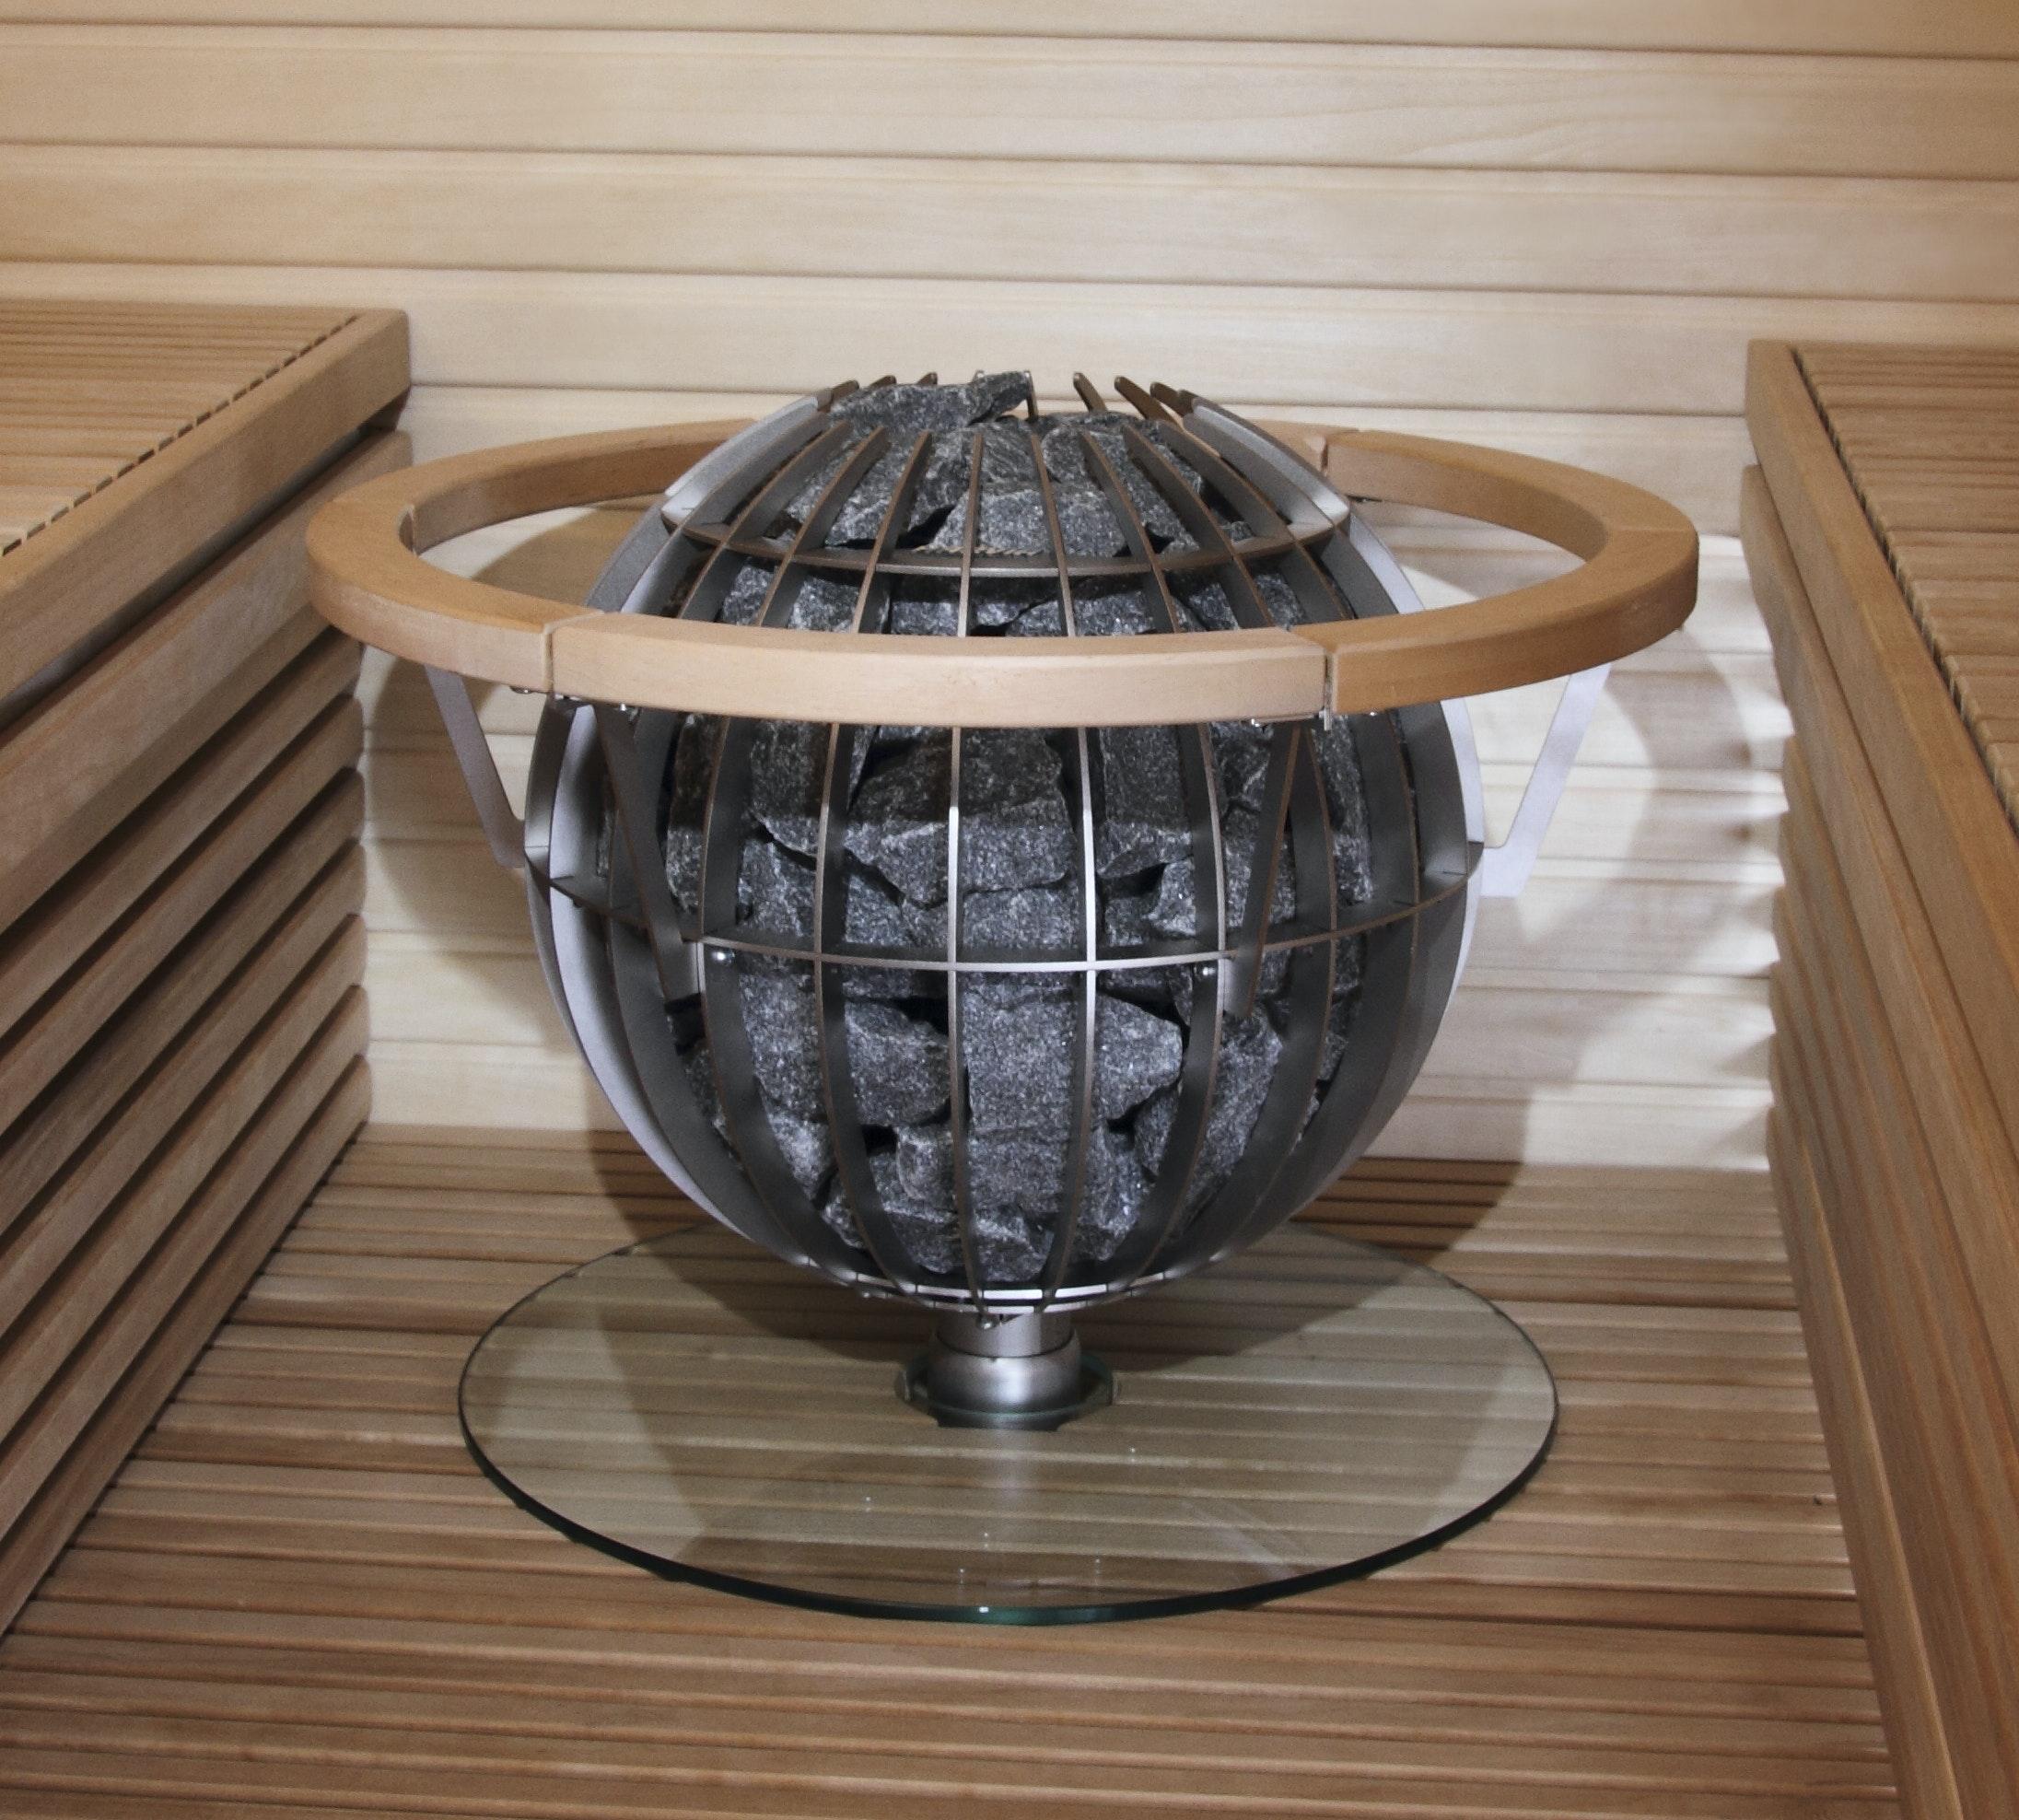 Bastuaggregat Harvia Globe 6,9 kW GL70